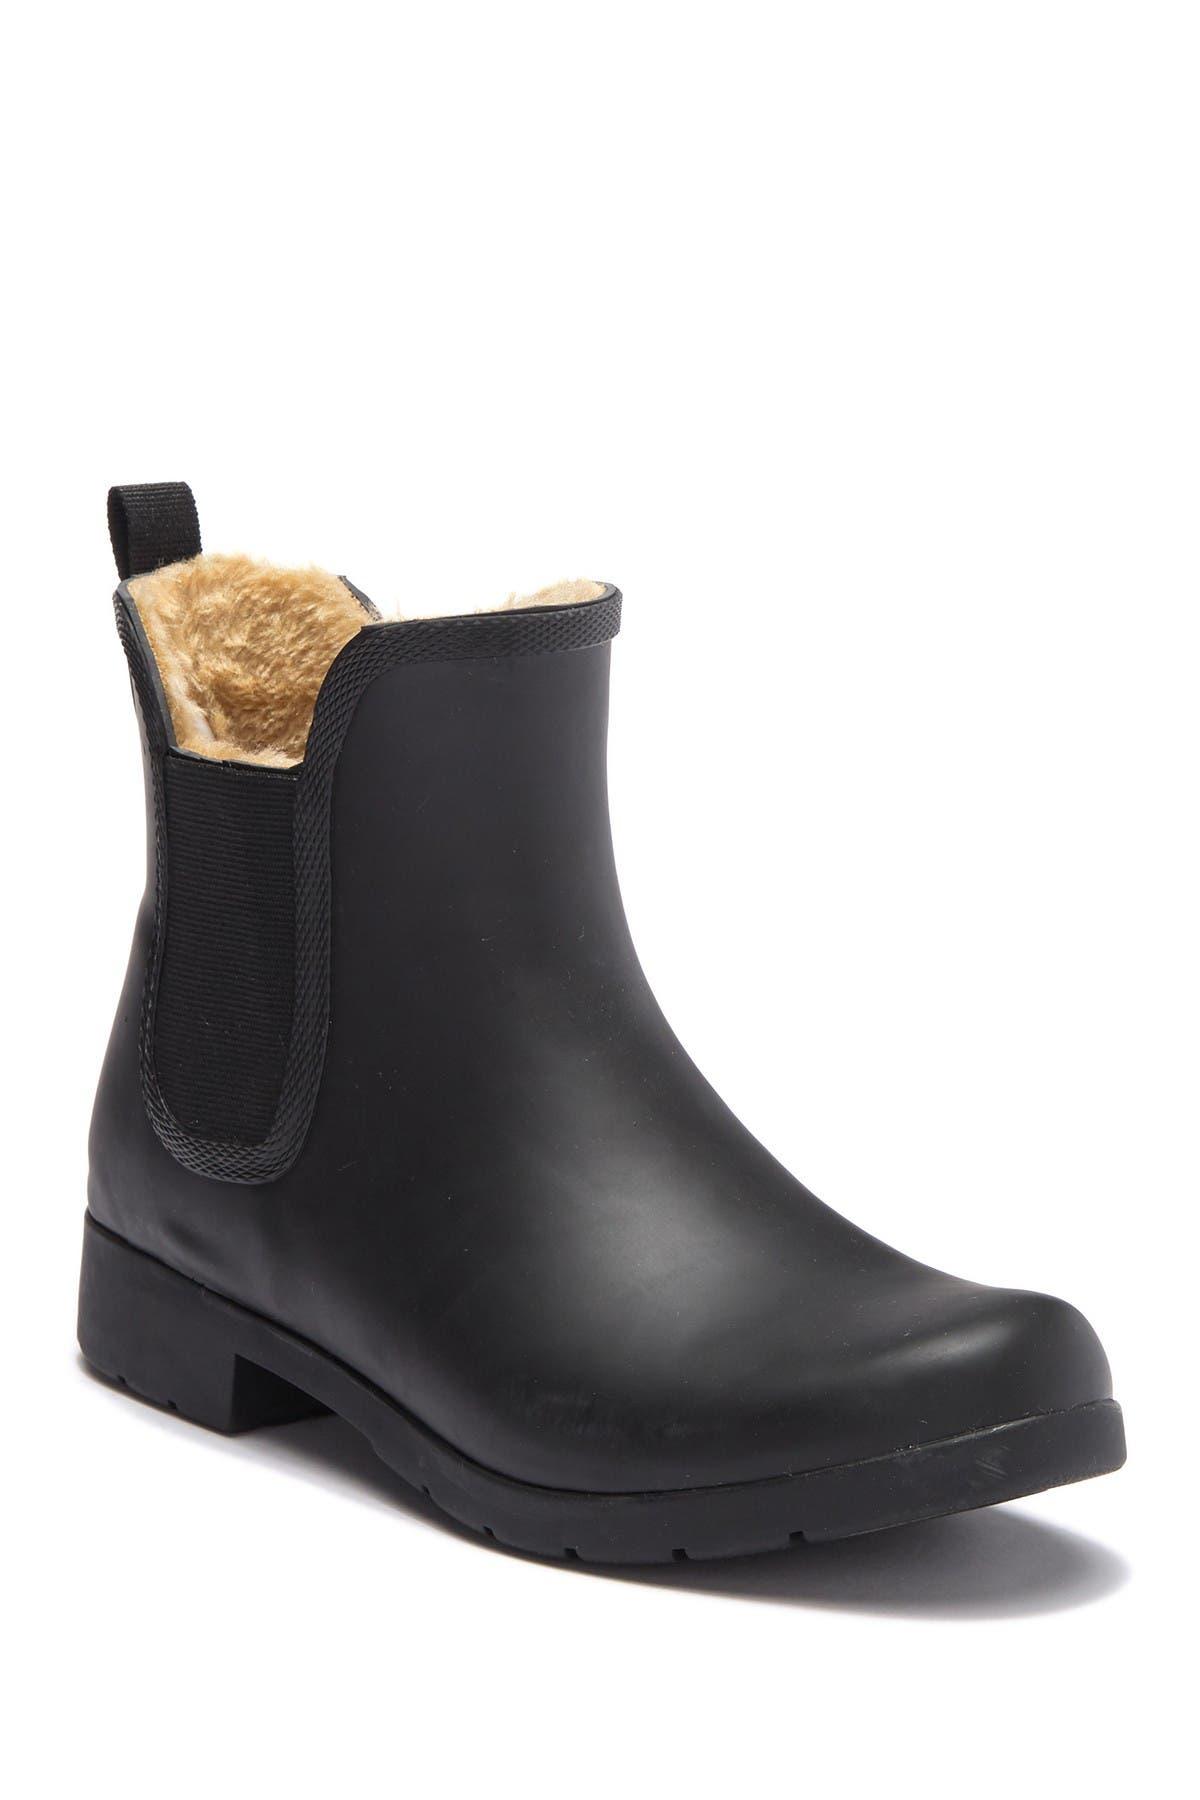 Waterproof \u0026 Weather Resistant Boots